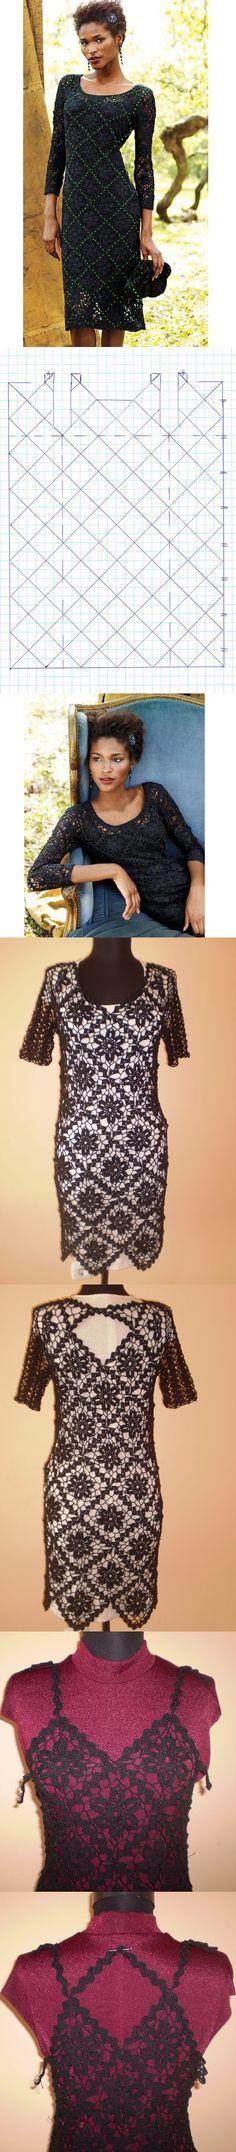 Use continuous squares pattern instead of individual Conexão peruana Crochet Bolero Pattern, Crochet Cardigan, Knit Dress, Crochet Patterns, Dress Pants, Crochet Woman, Diy Crochet, Crochet Top, Crochet Squares